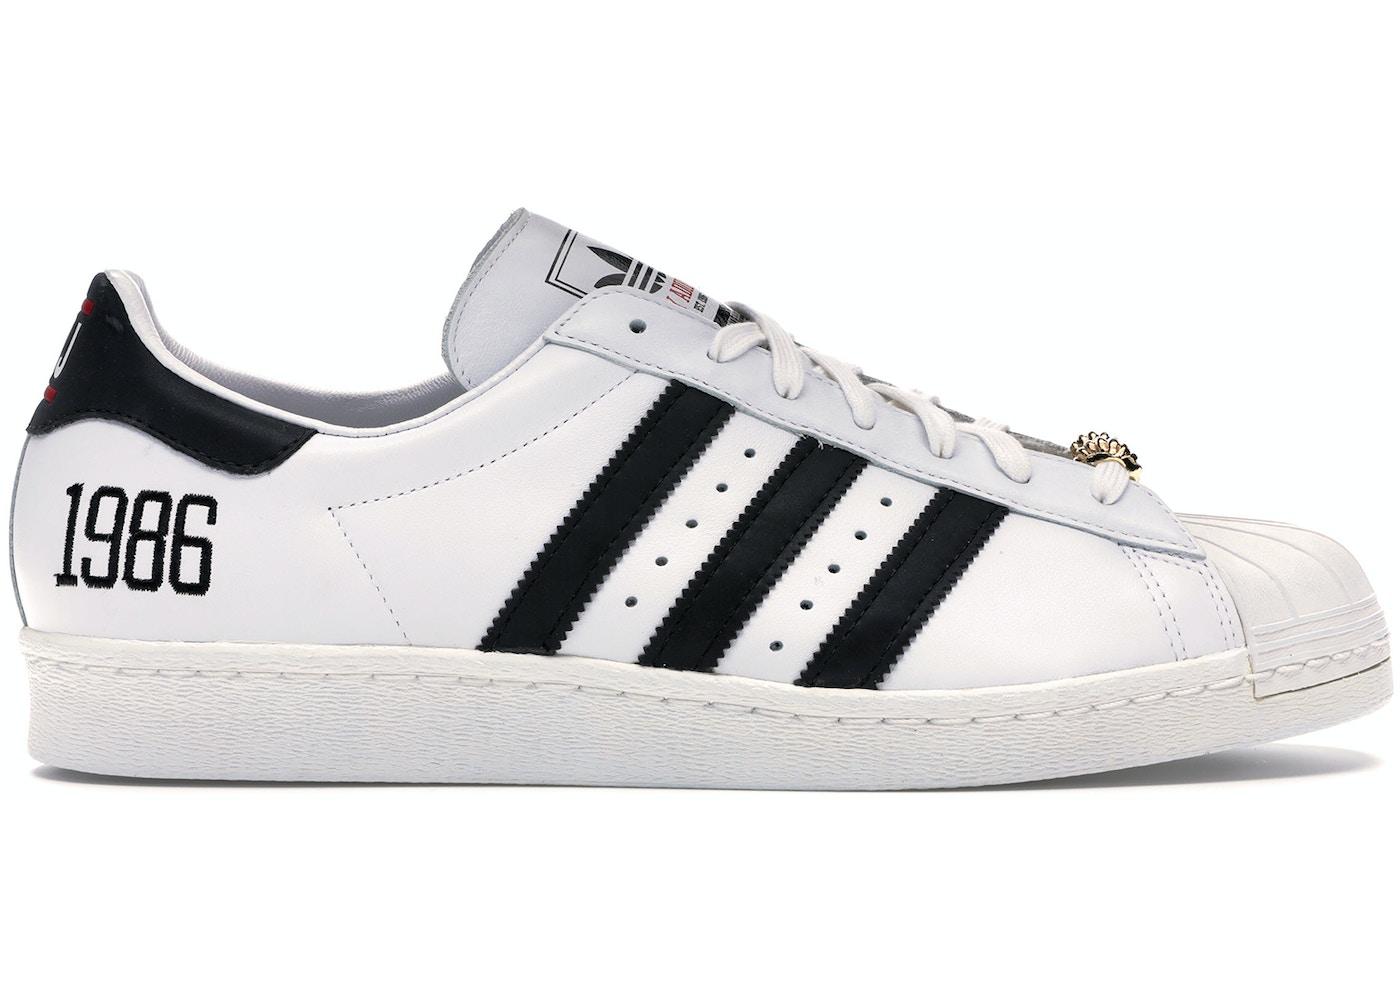 pausa Orientar Mal humor  adidas Superstar 80s My adidas Run DMC 25th Anniversary - G48910